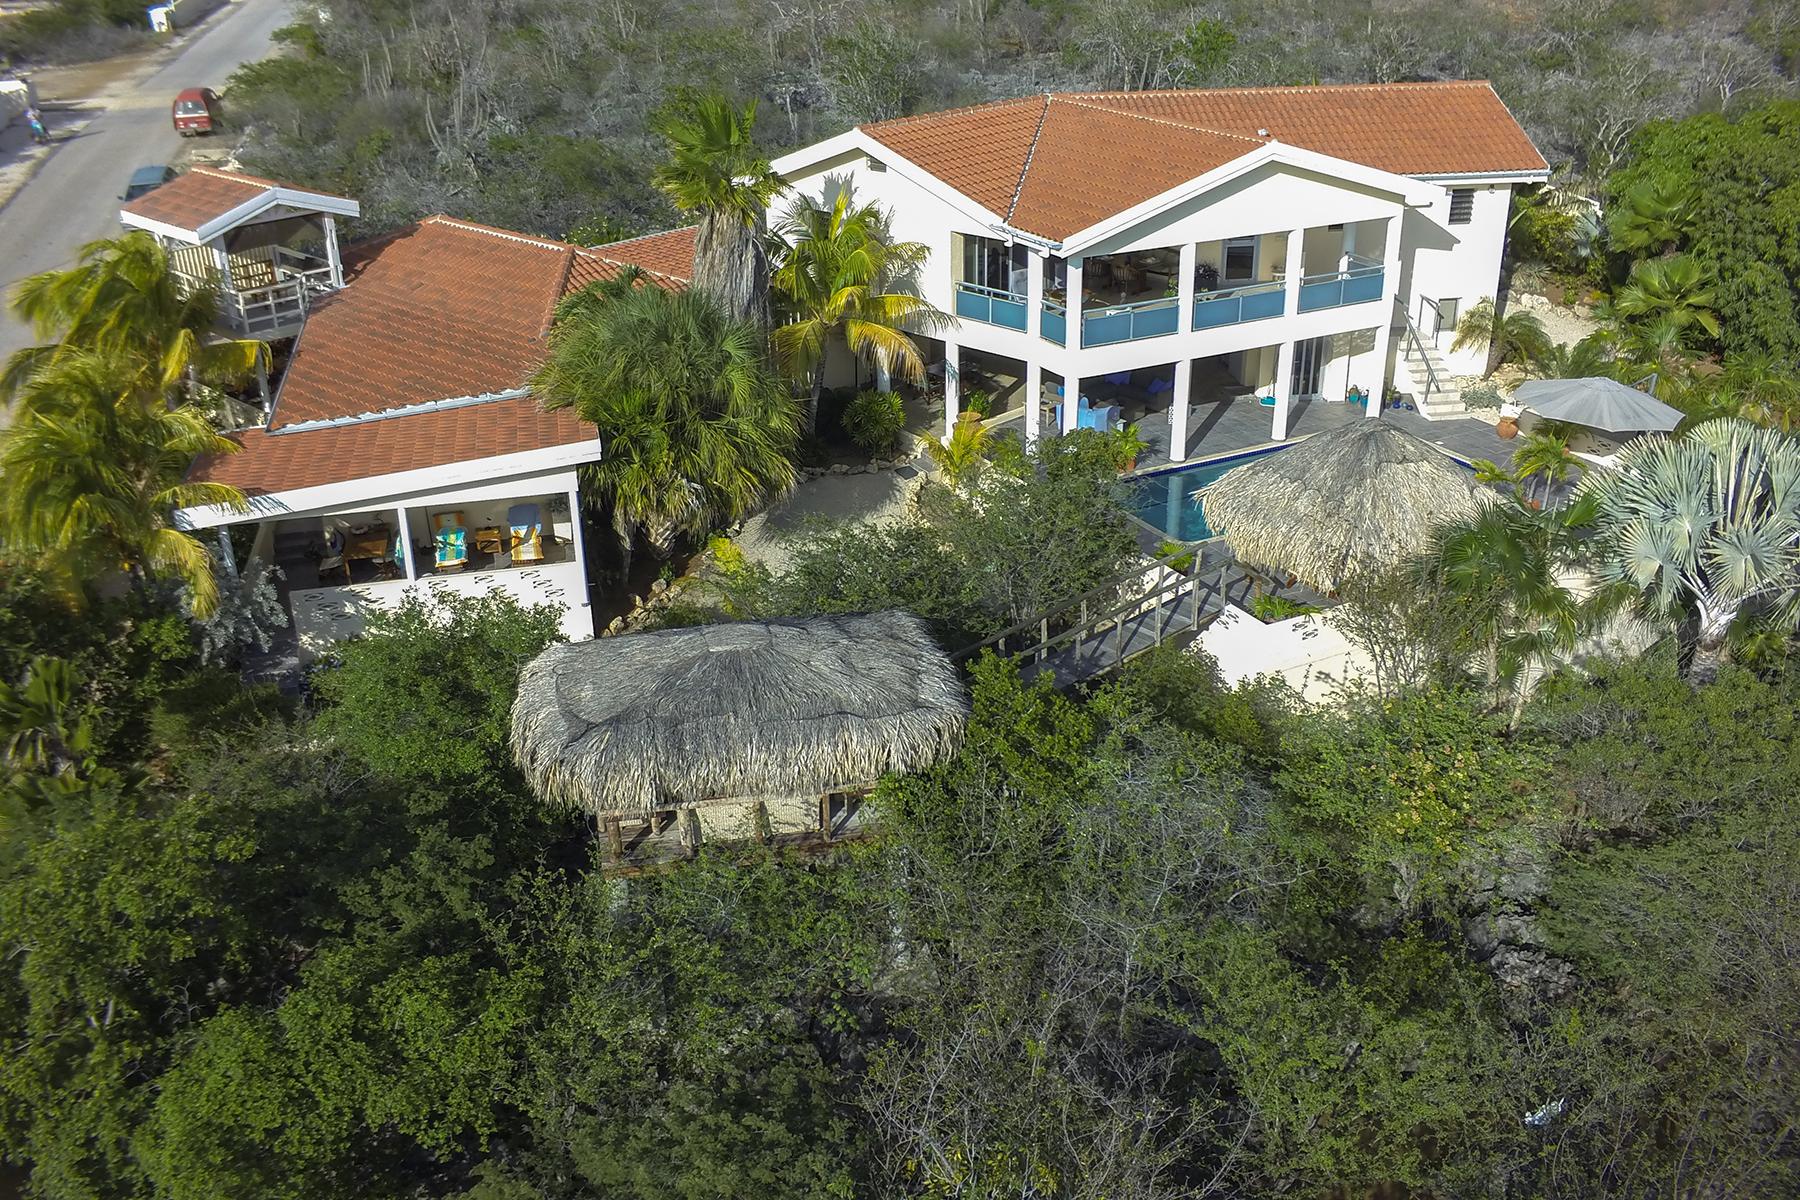 Single Family Home for Sale at Villa Bougainvillea Sabadeco, Bonaire